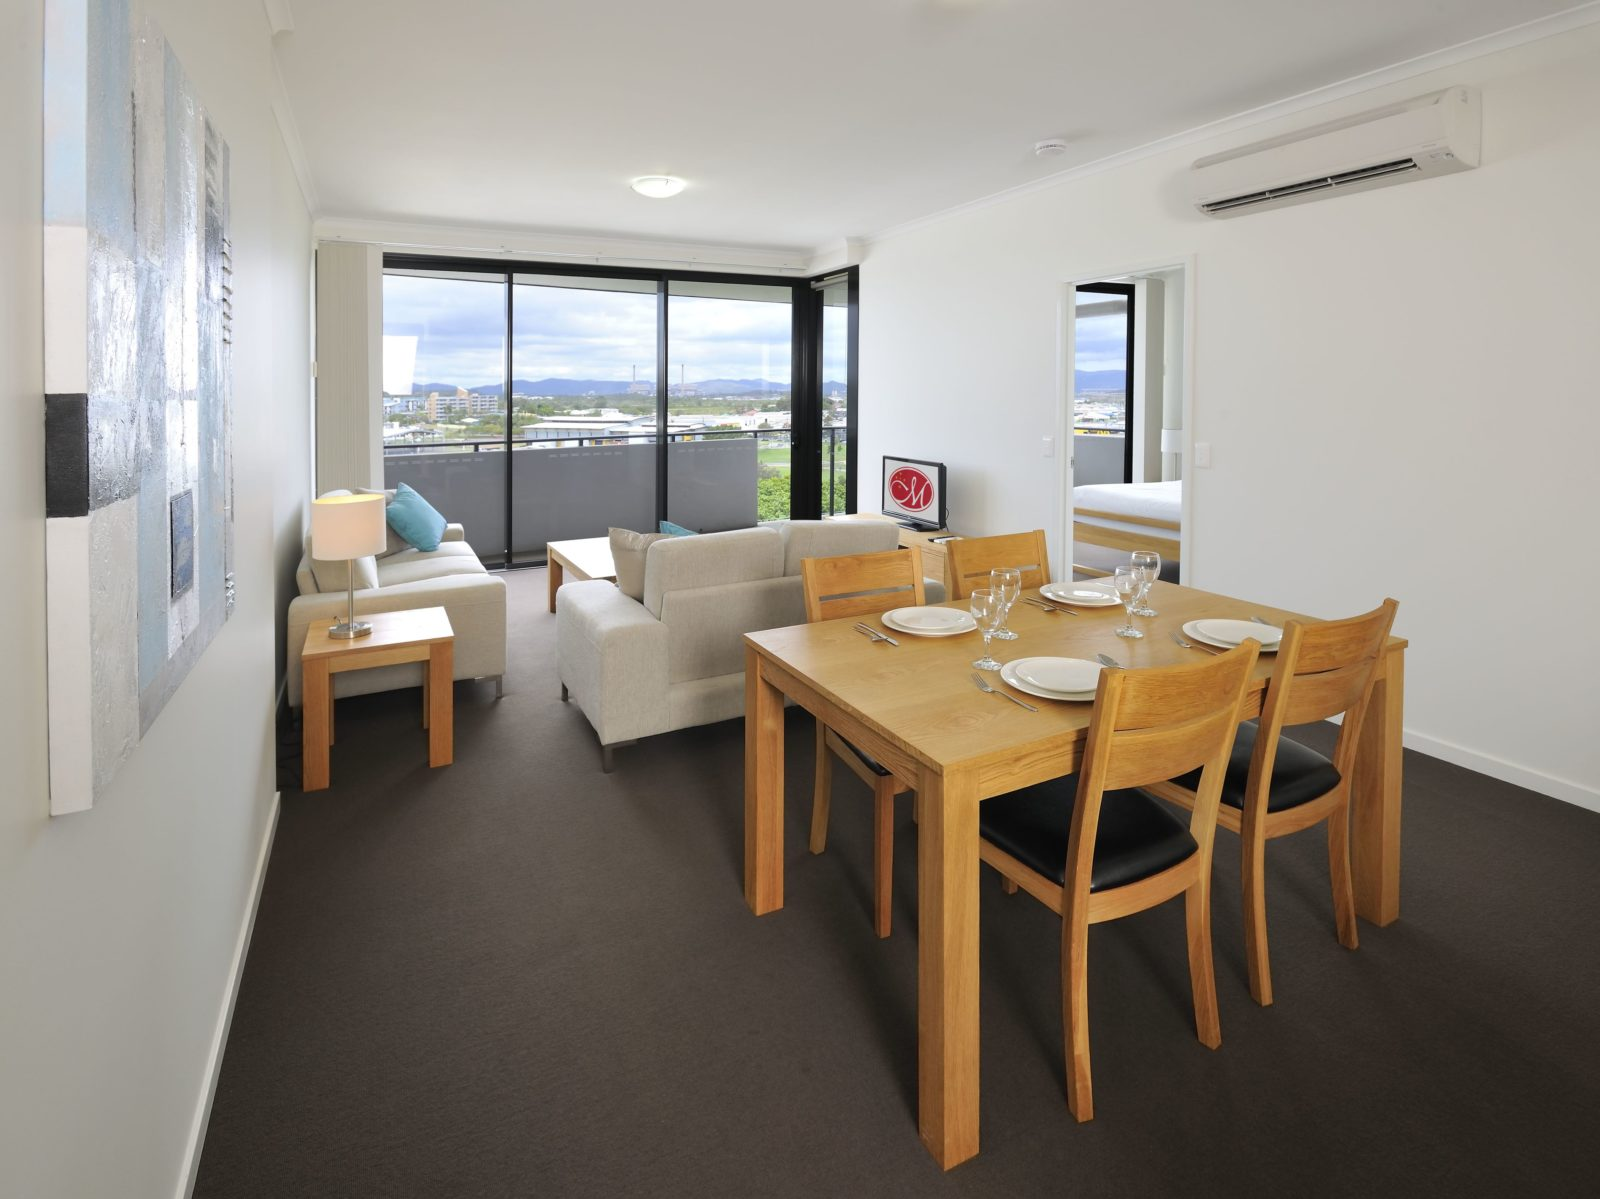 Apartments G60 Gladstone 2 bedroom apartment